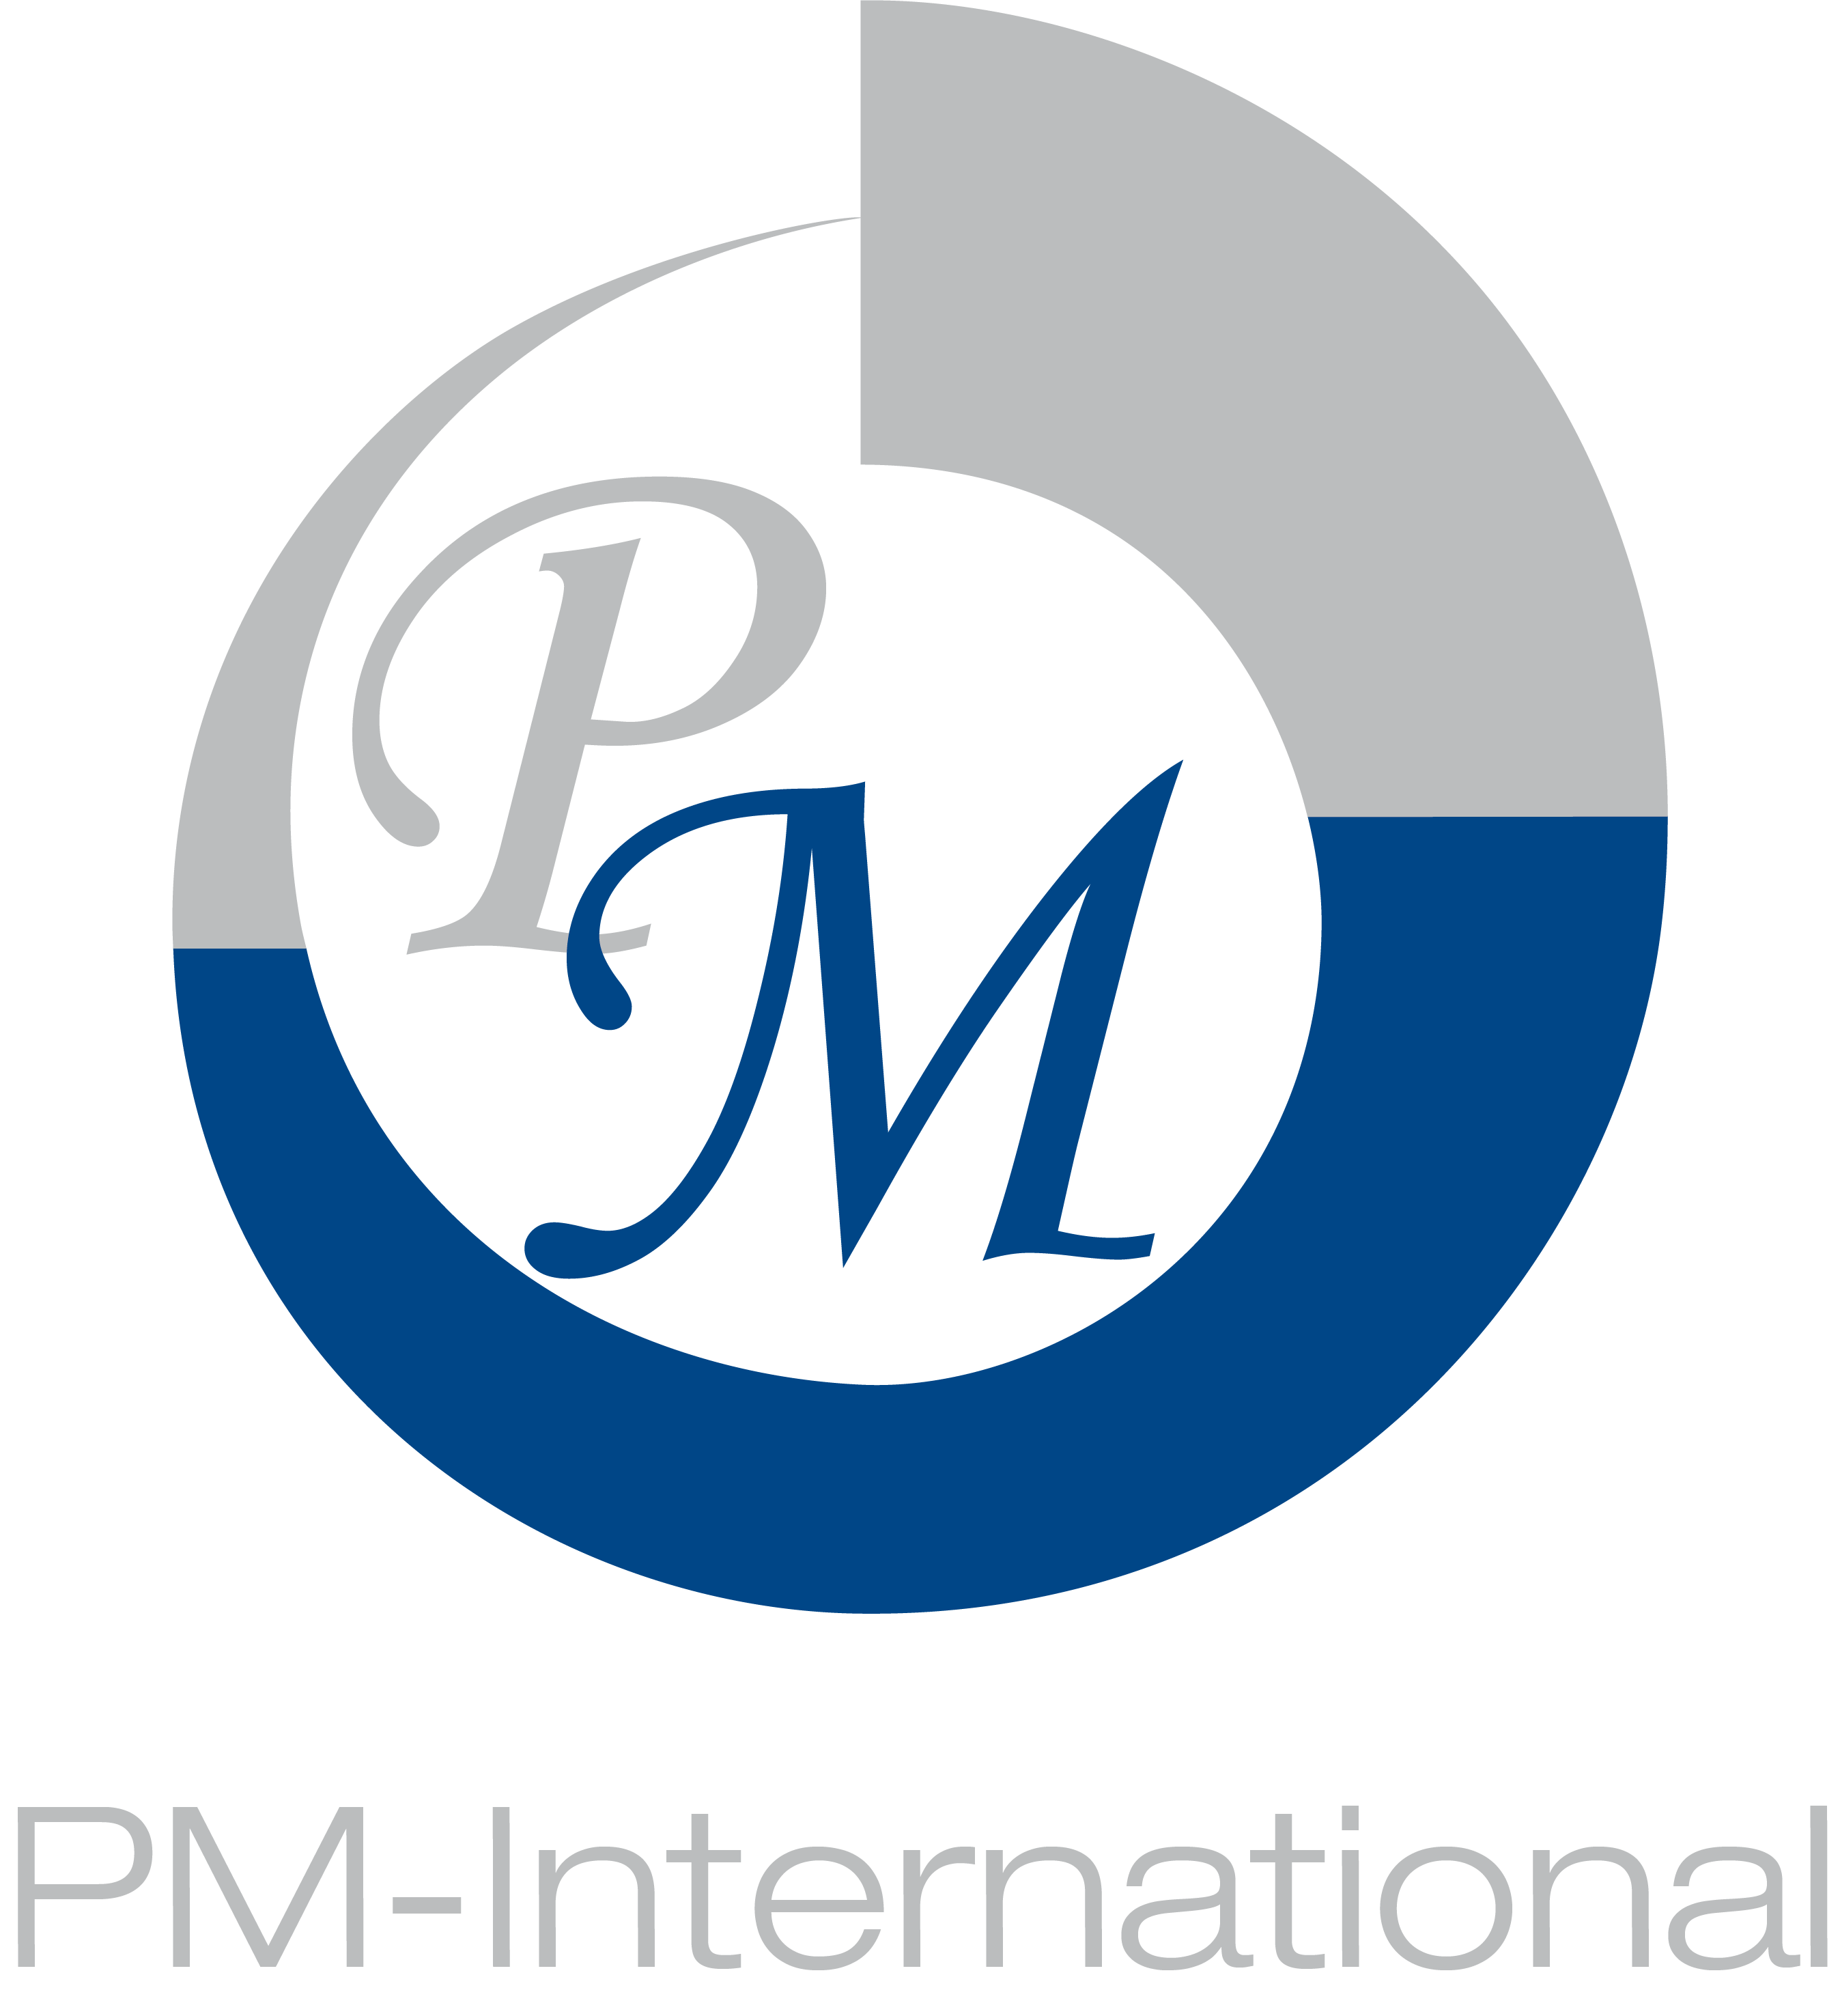 pm international ag